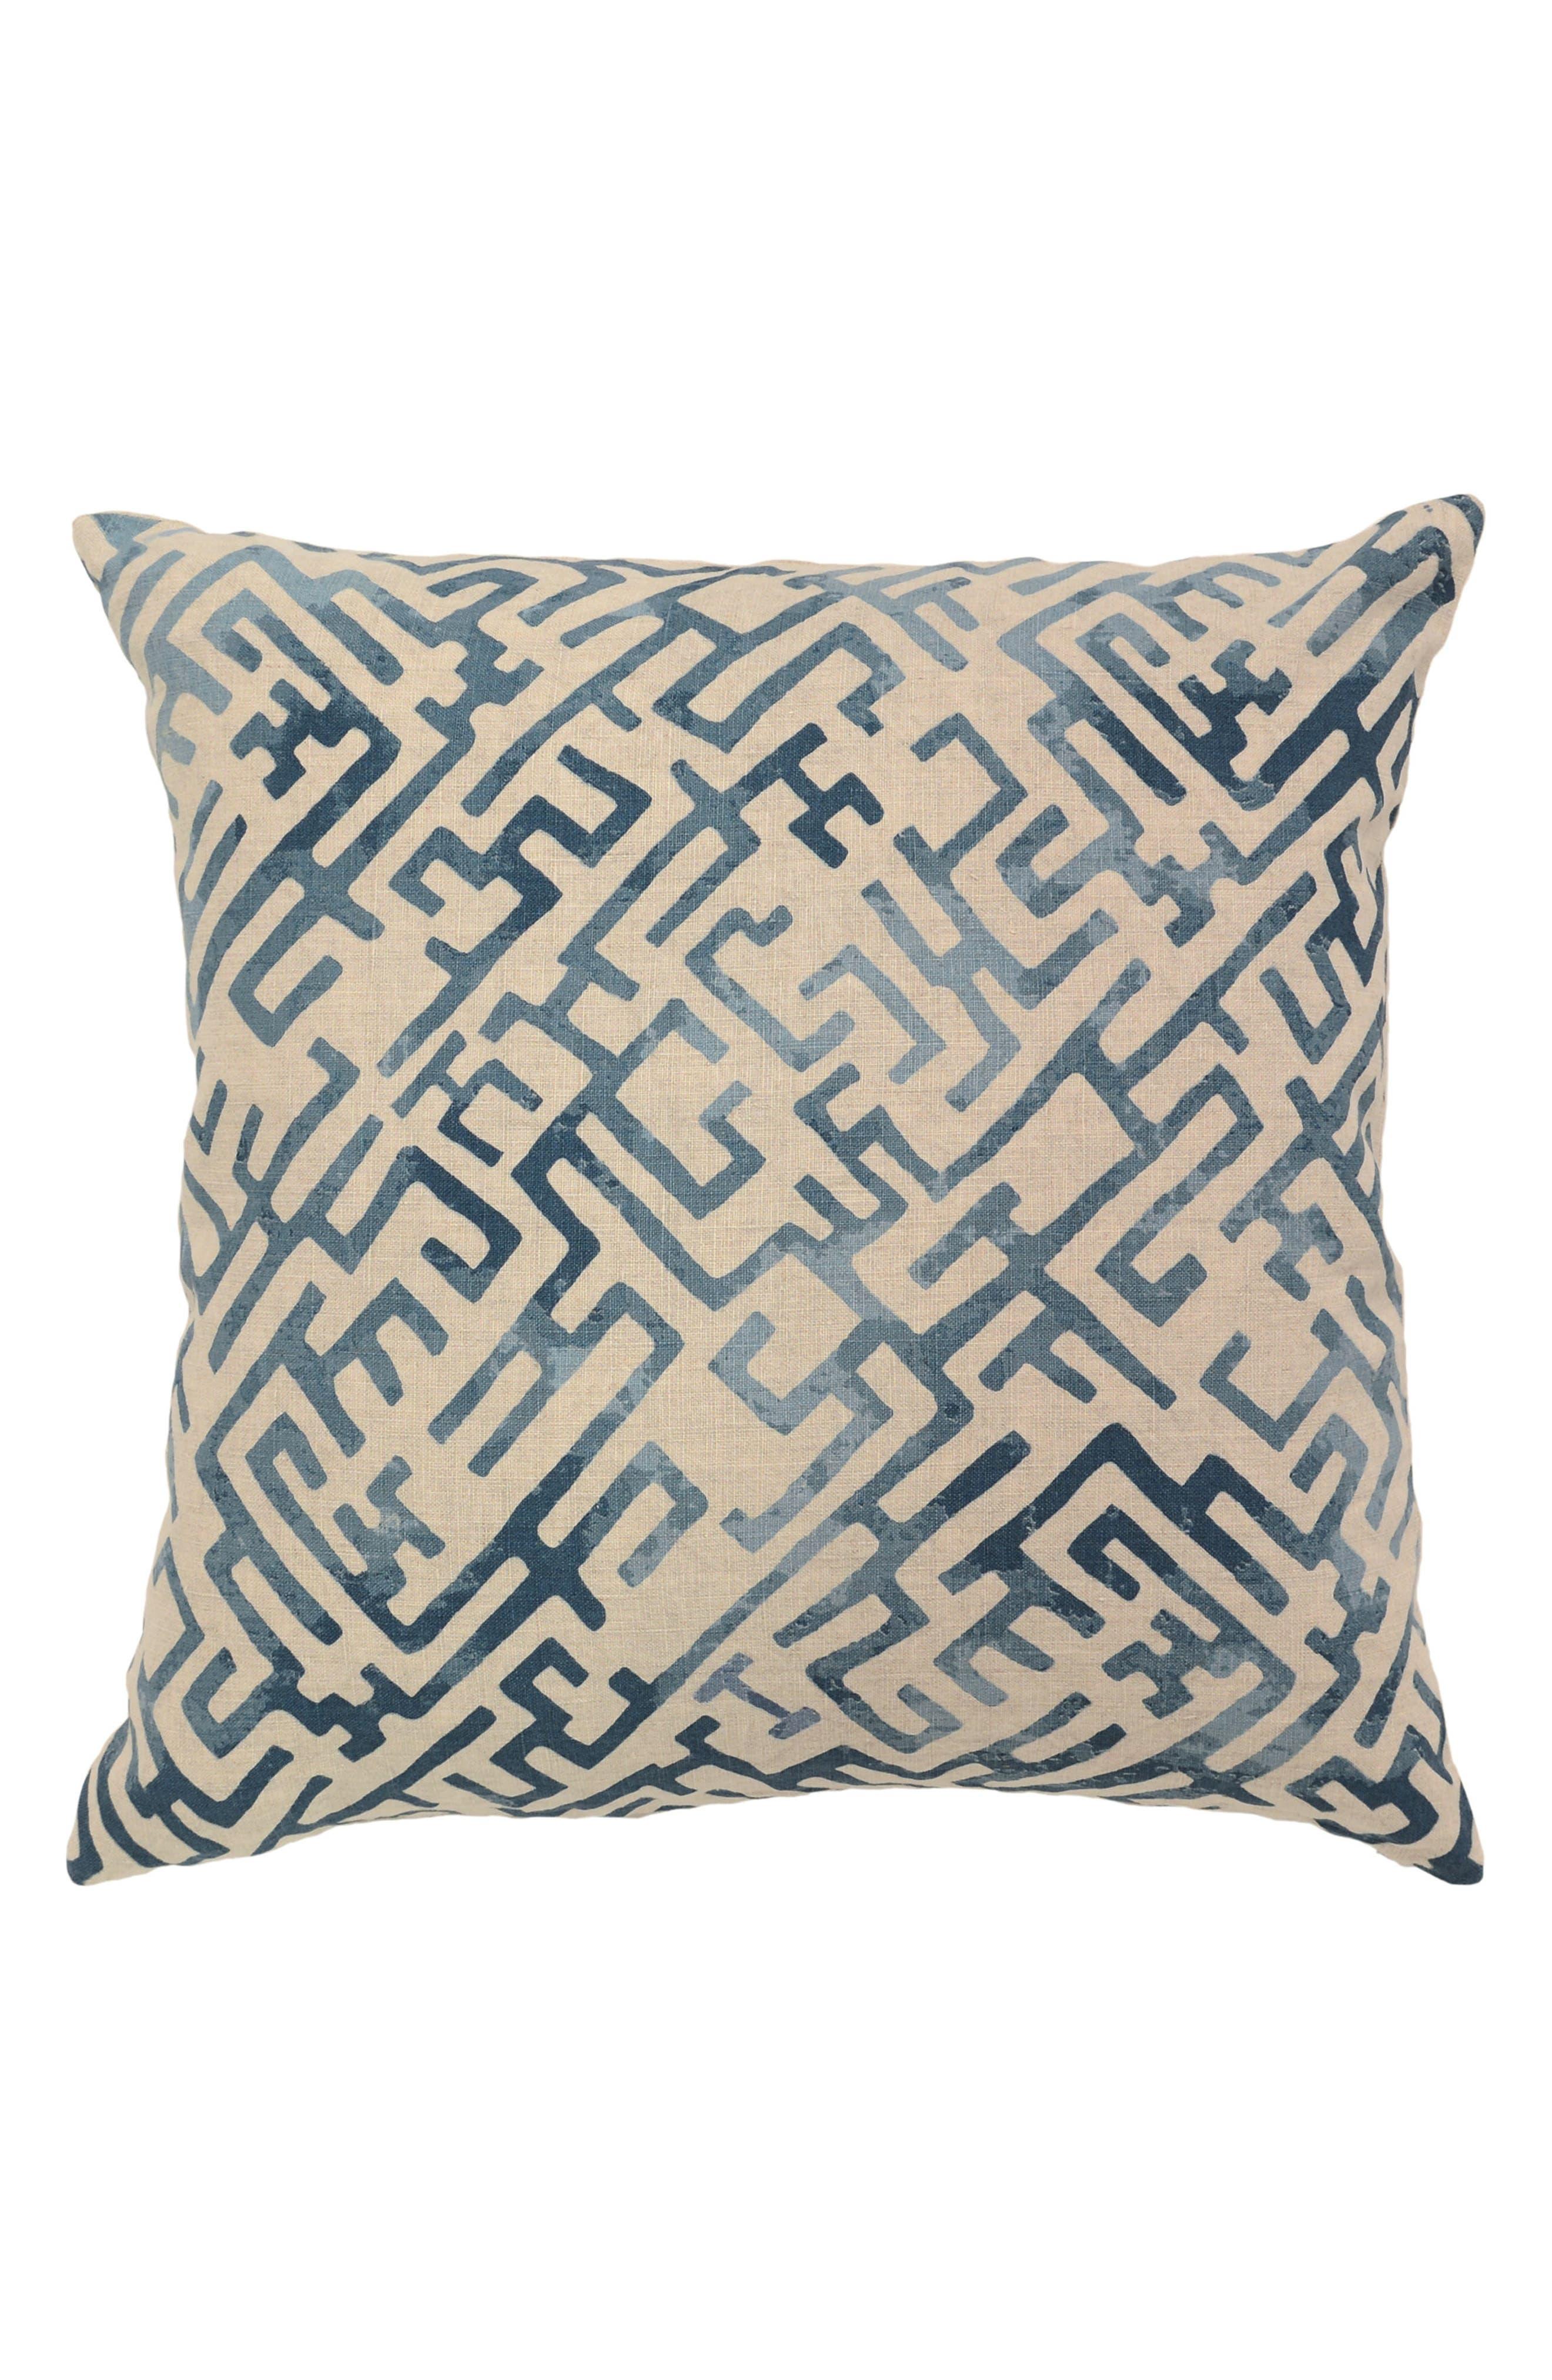 Marin Pillow,                         Main,                         color, Blue